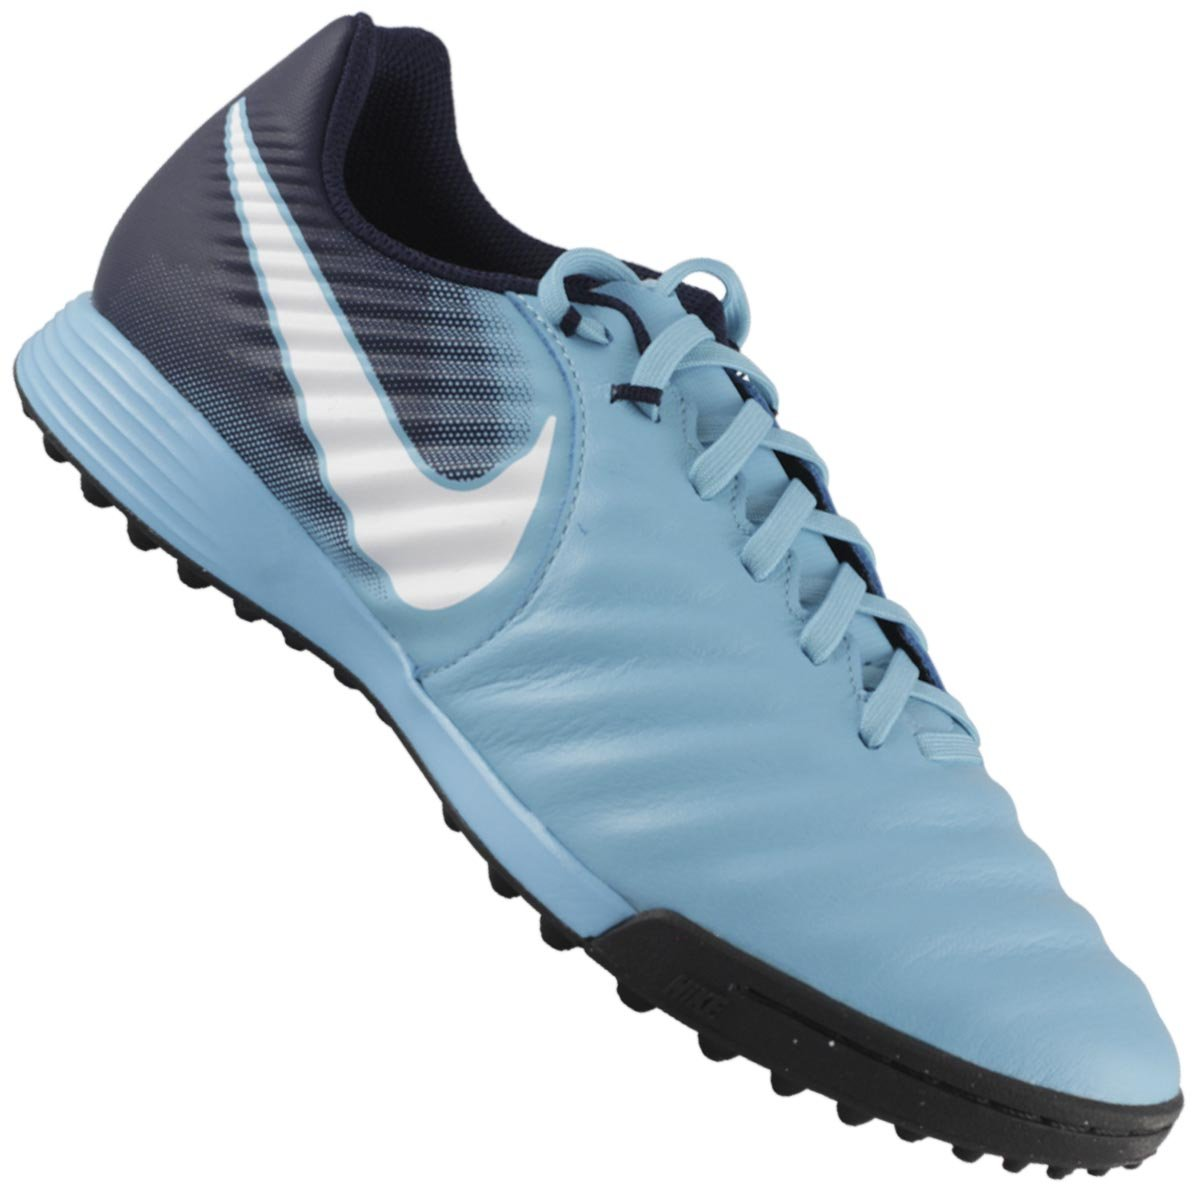 304921083f ... Mercurial Prata e Preto f97ff061f7abe1  Chuteira Society Nike Tiempox  Ligera Iv Tf Treino e Corrida a99bffe3d1f643 ...